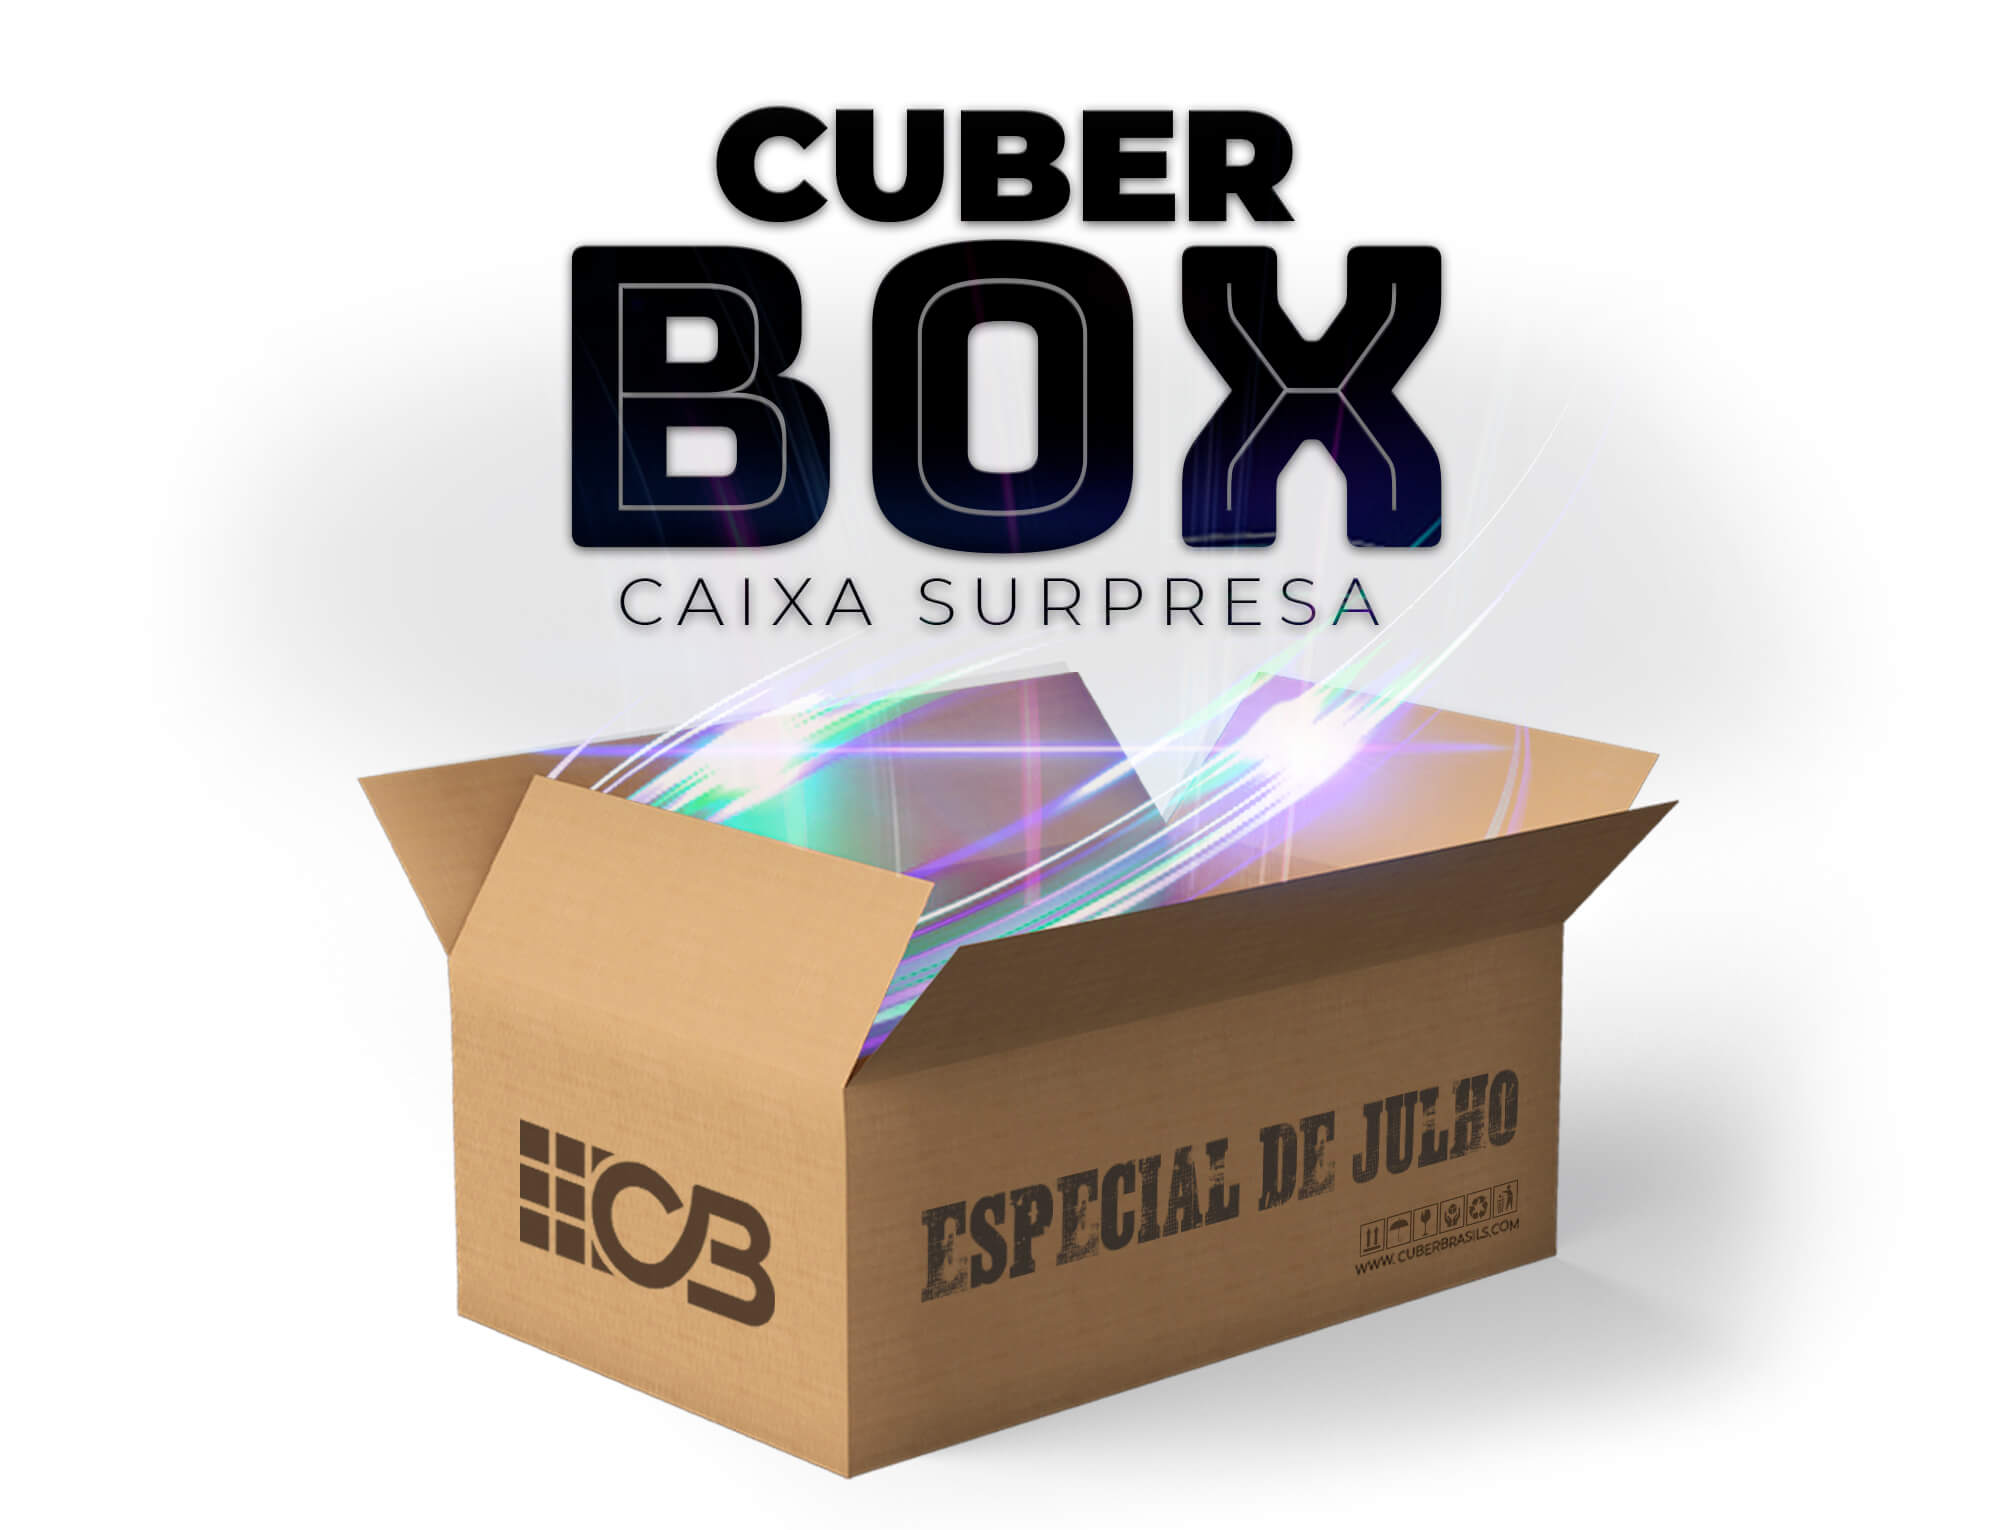 CUBER BOX - CAIXA SURPRESA JULHO